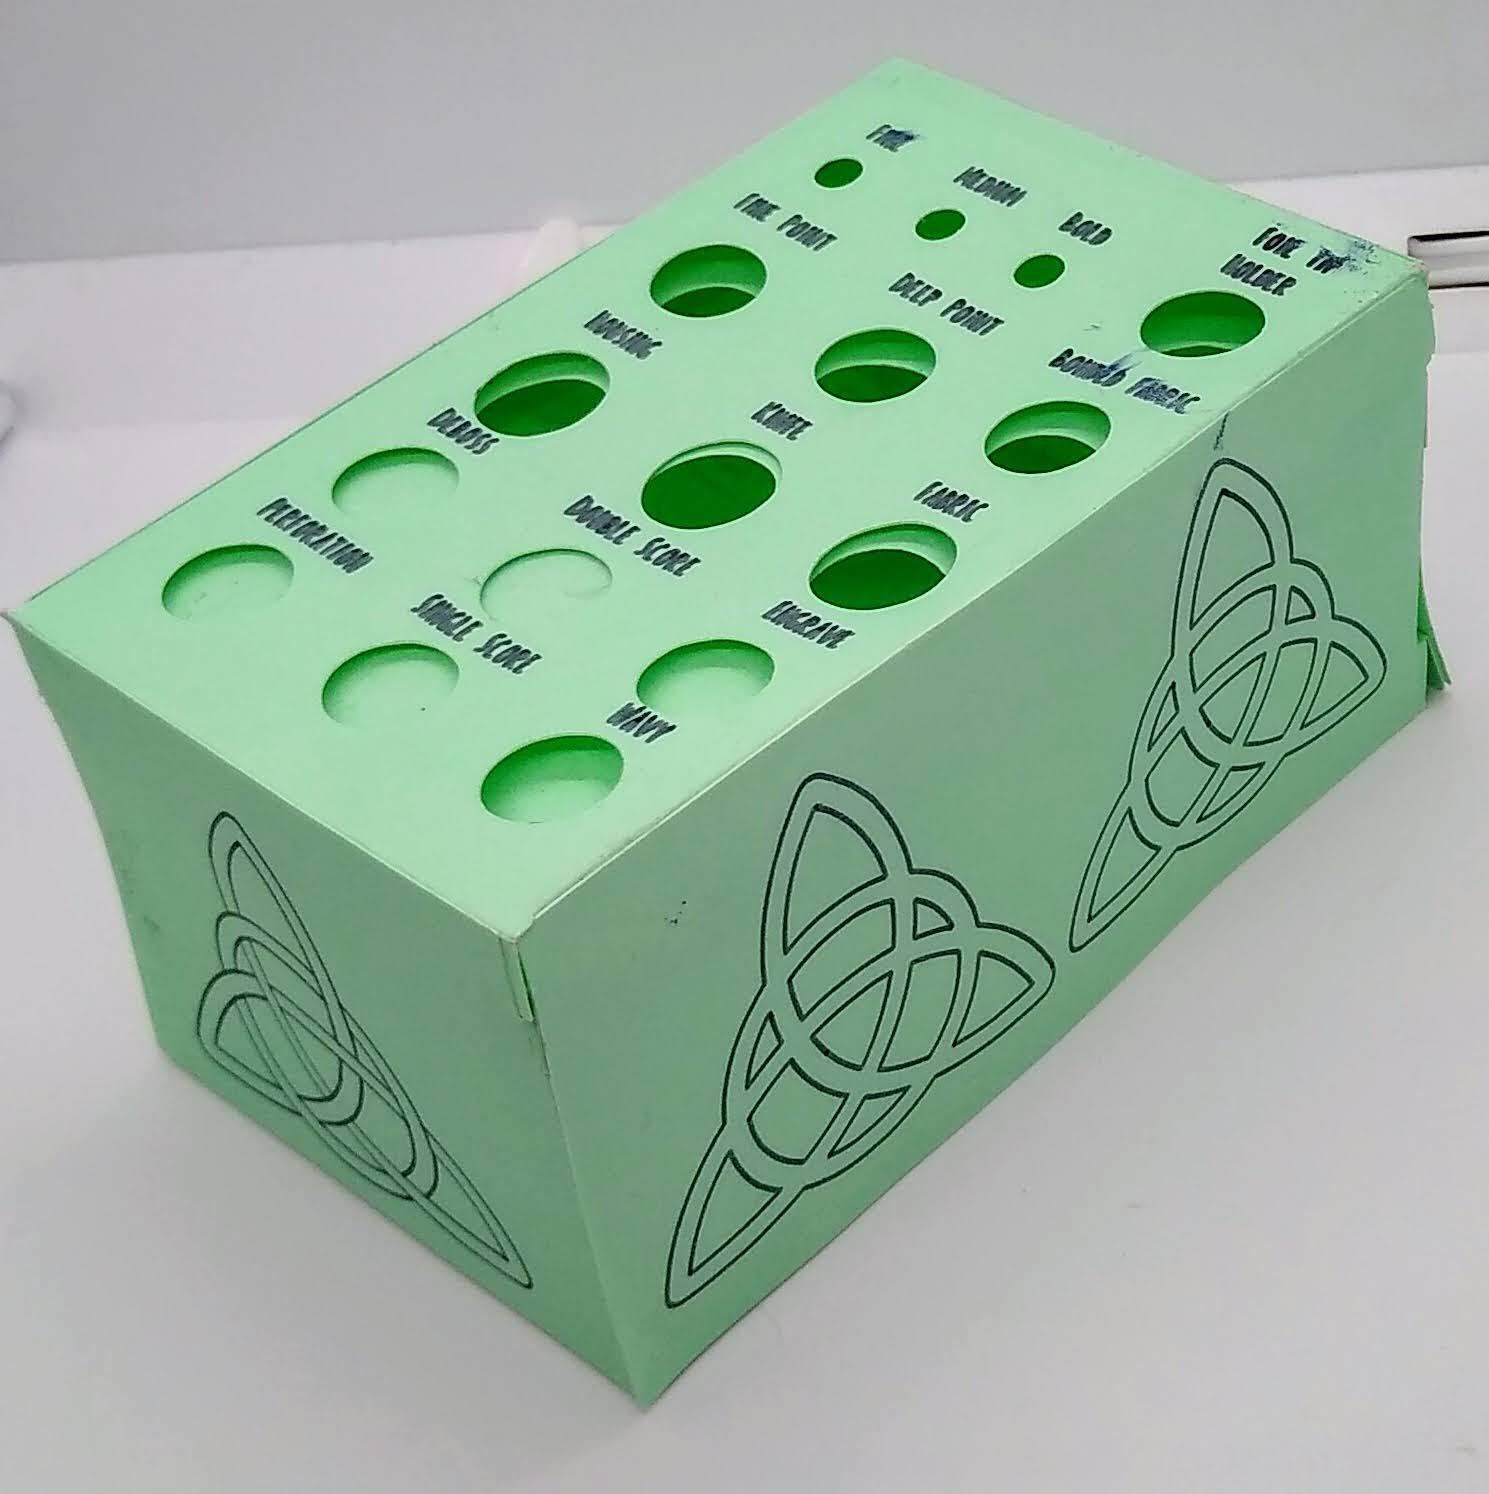 A Redesigned Blade Holder for Foiling Kit Tips